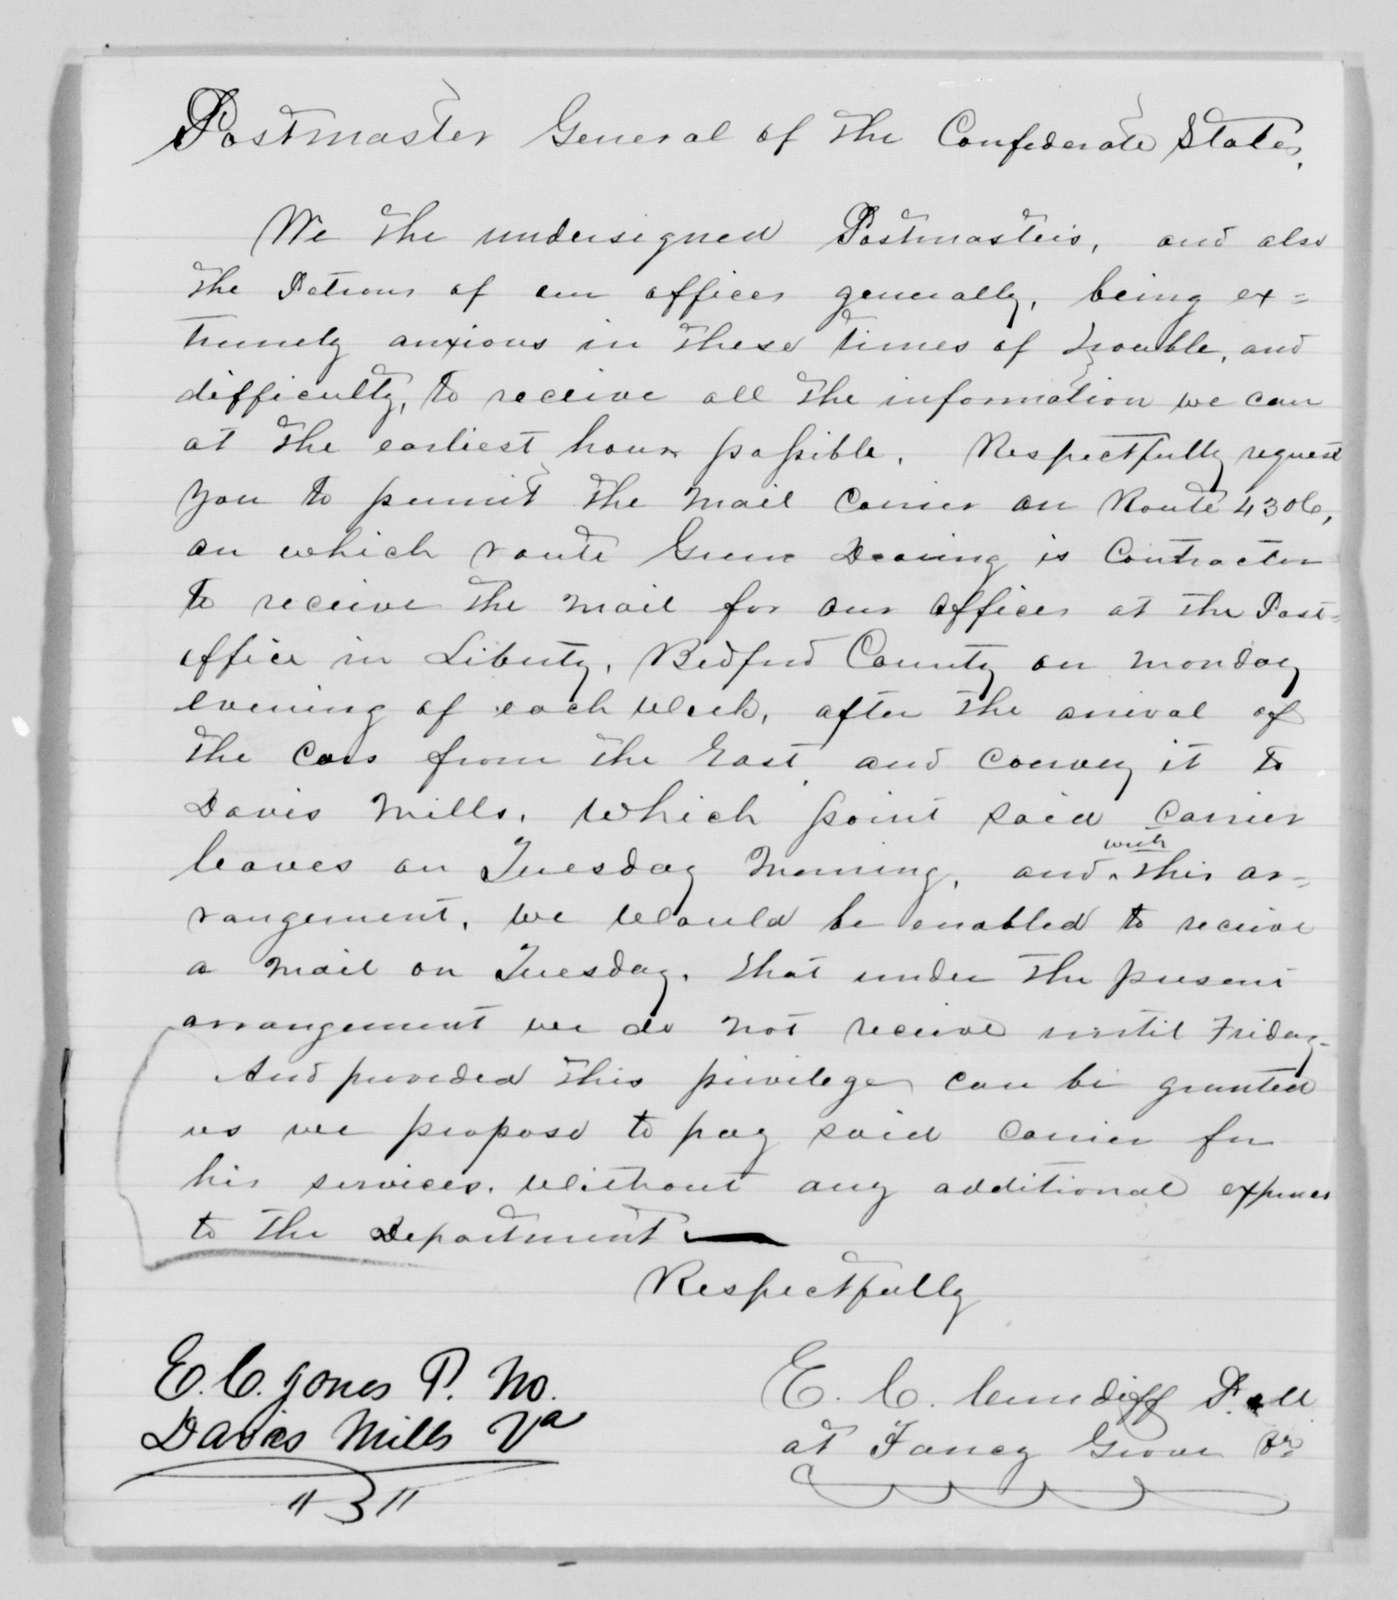 Confederate States of America records: Microfilm Reel 61